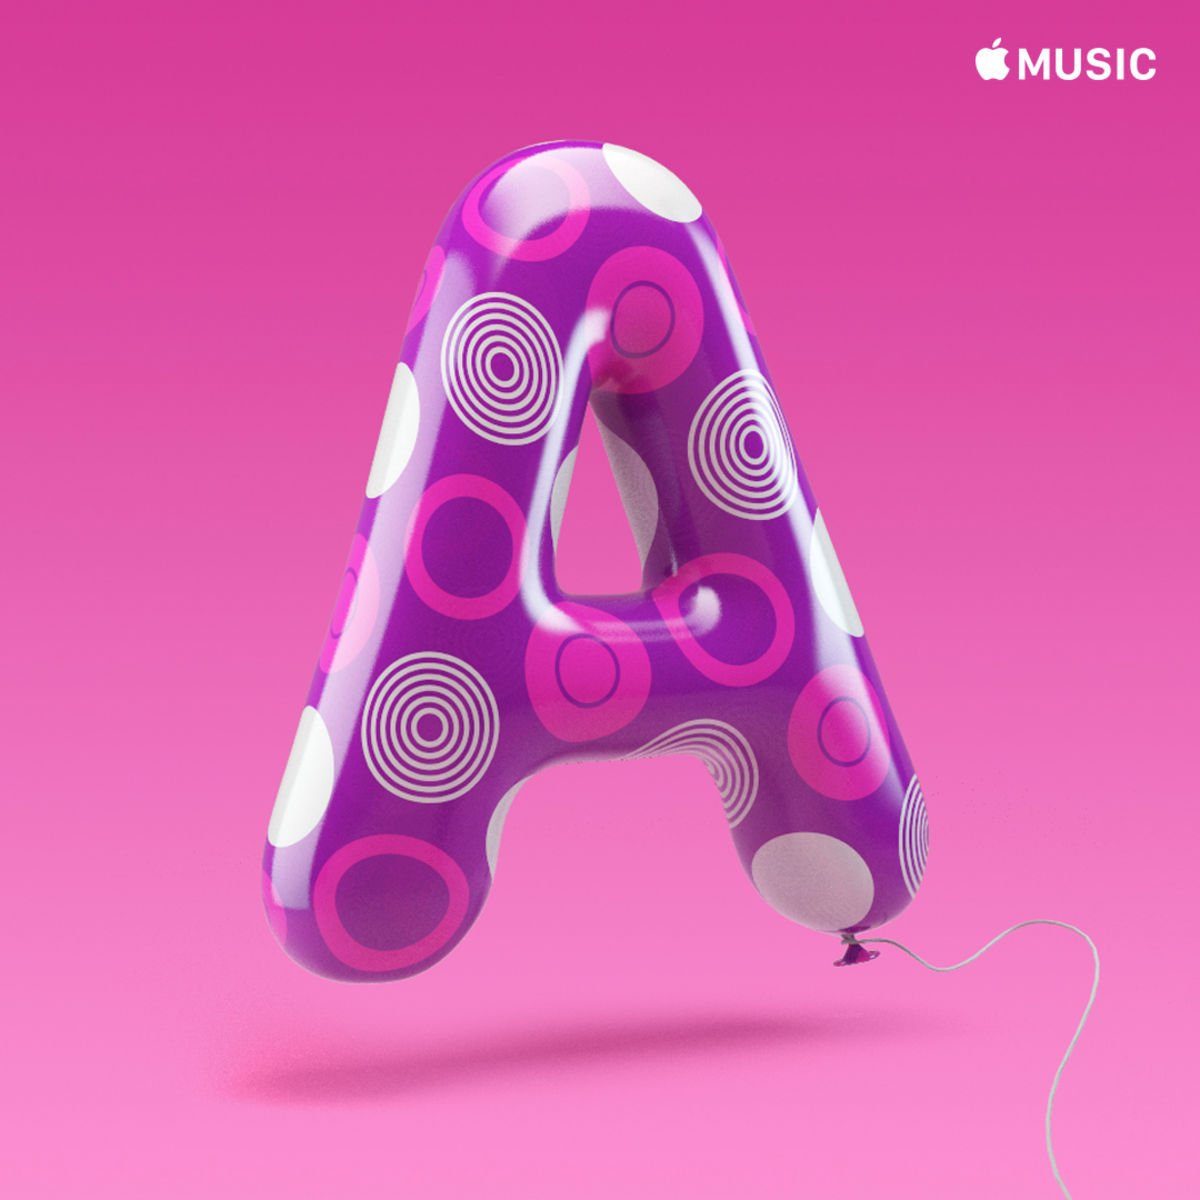 #NowThatIFoundYou landed on @AppleMusic's 'The A-List: Pop' playlist ��https://t.co/szYCmzx15Q https://t.co/56KWdFPGbM